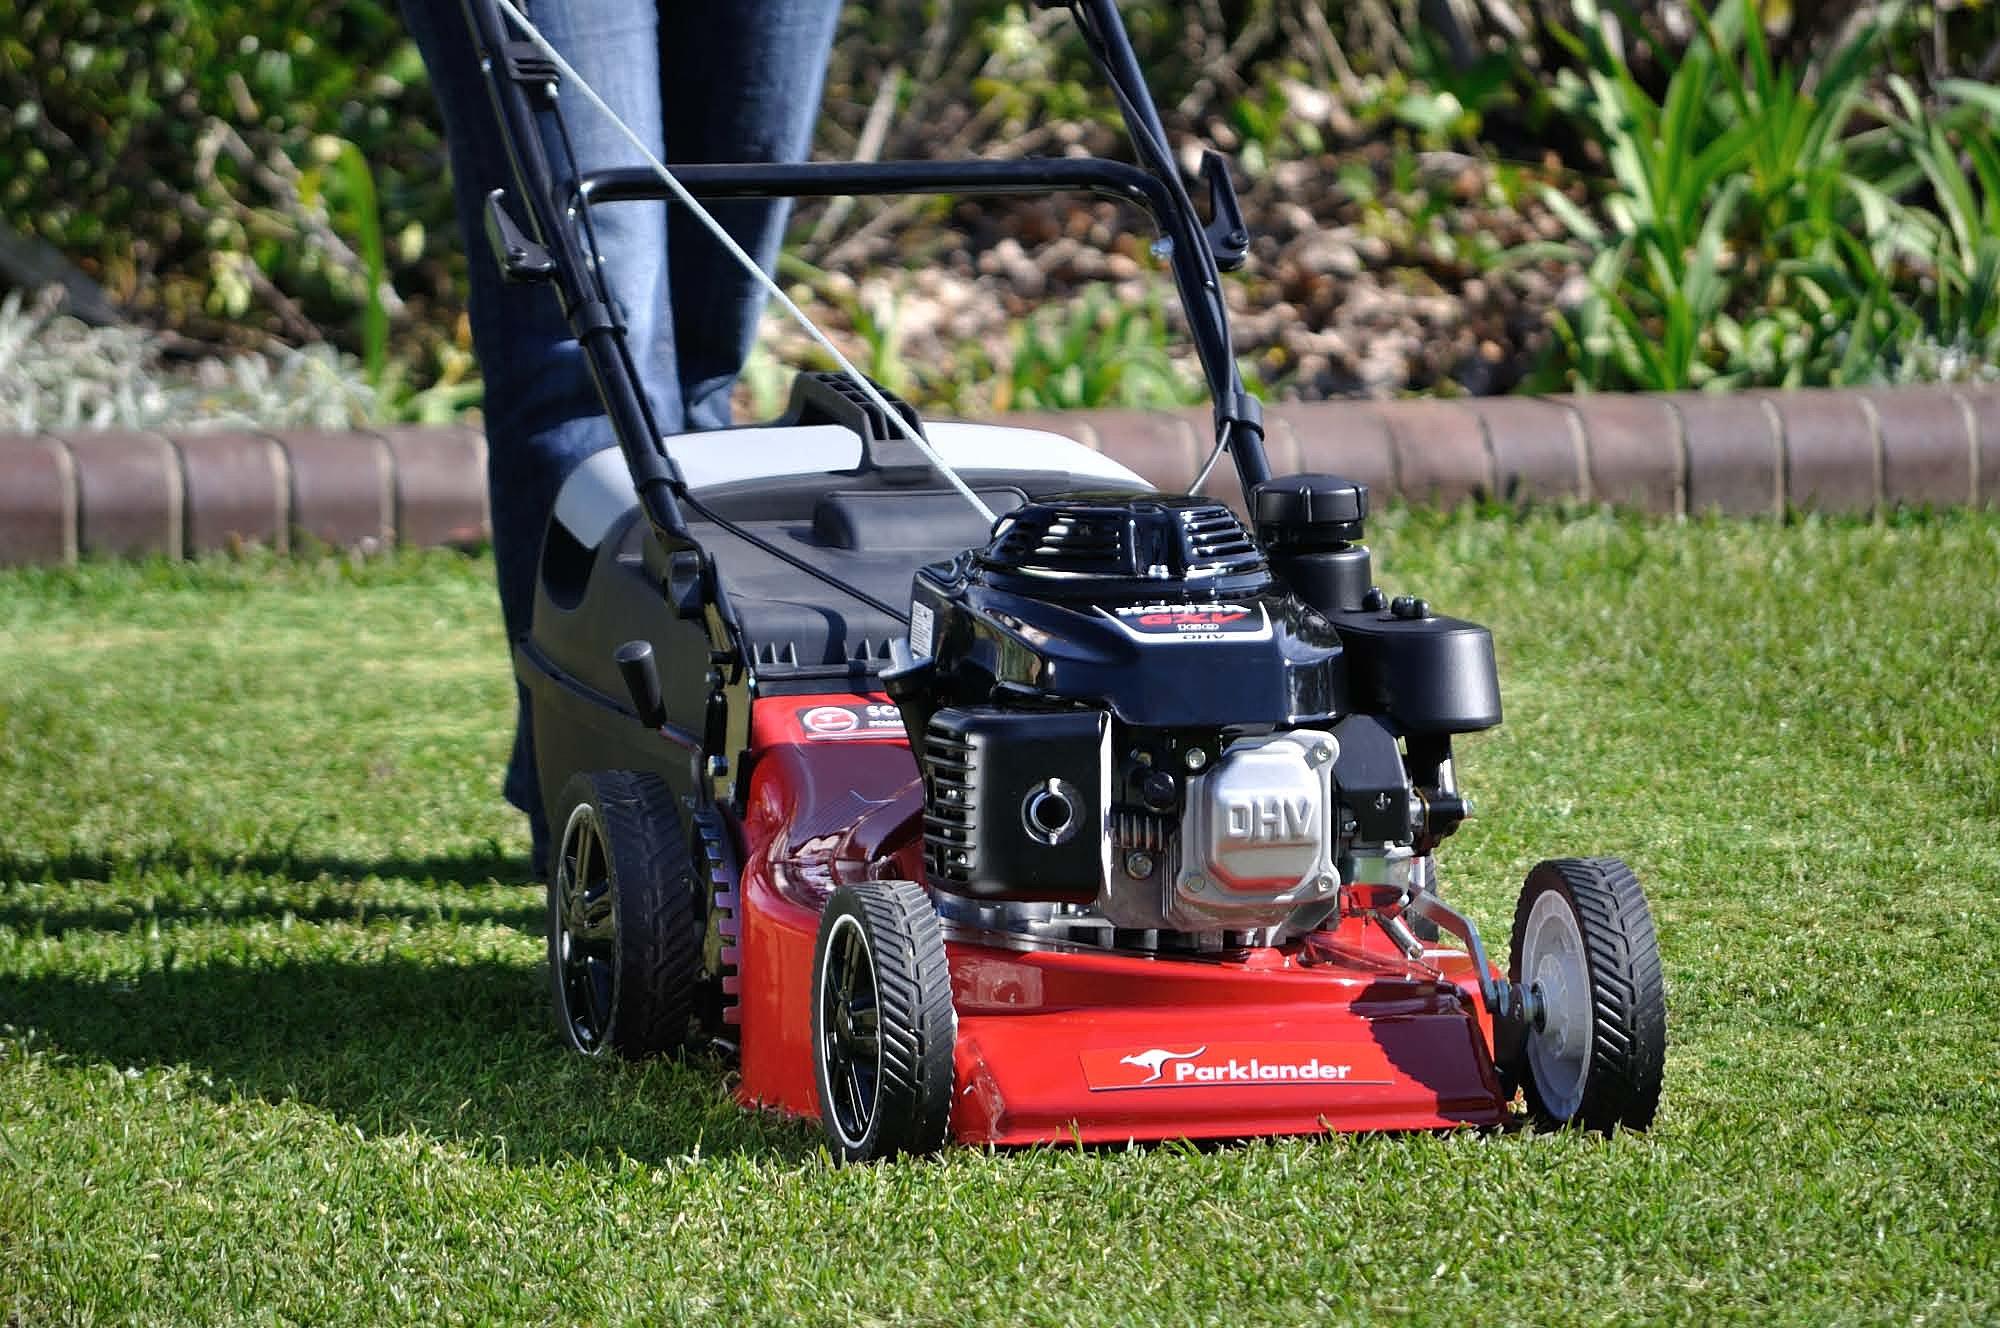 Outdoor Power Equipment Warehouse Lawn And Garden